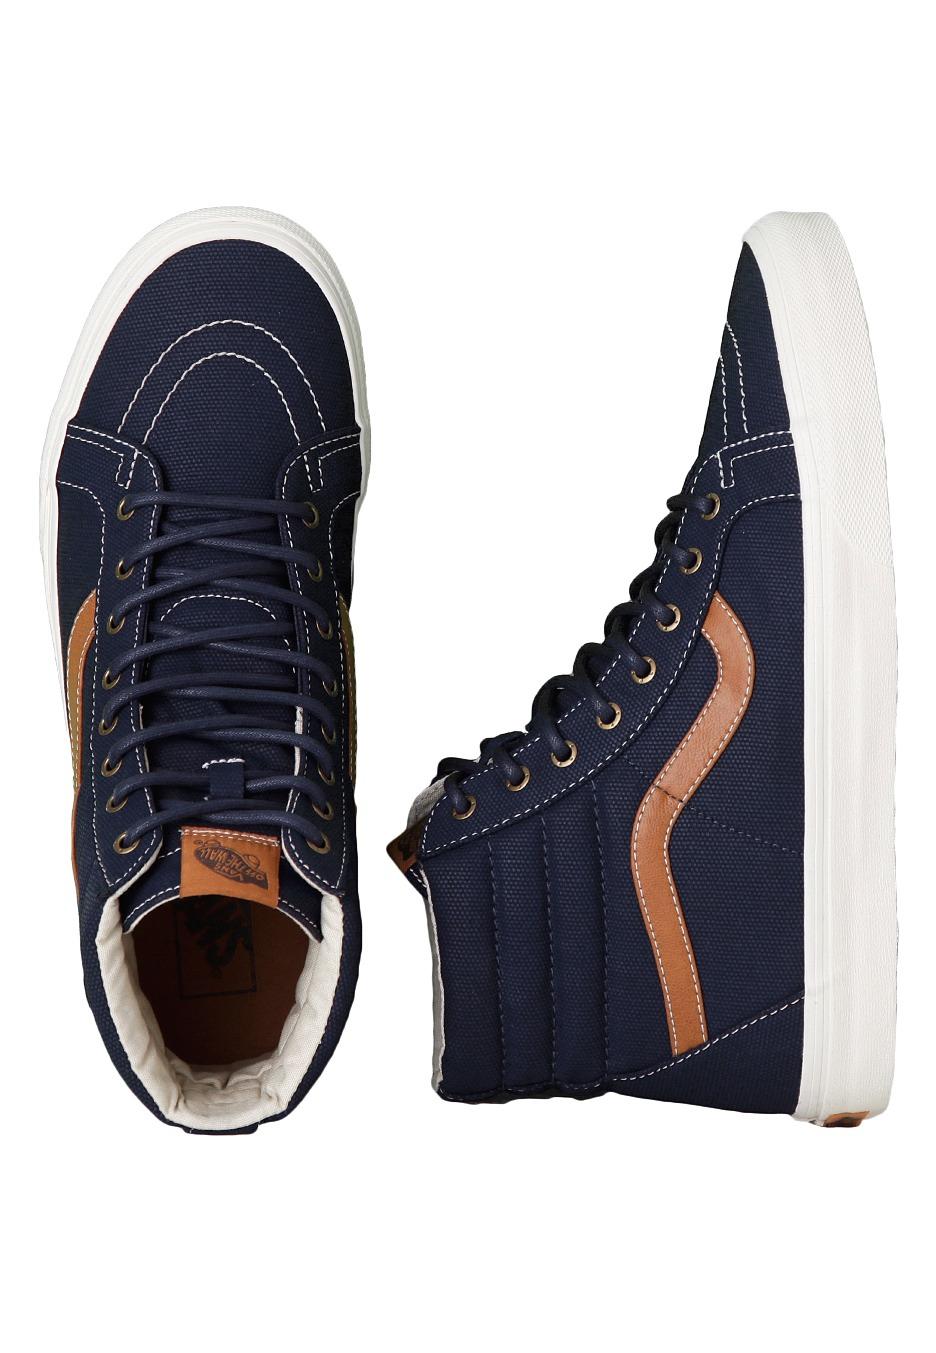 Vans - SK8-Hi Reissue Coated Canvas Dress Blue - Shoes - Impericon.com UK a4424bff5